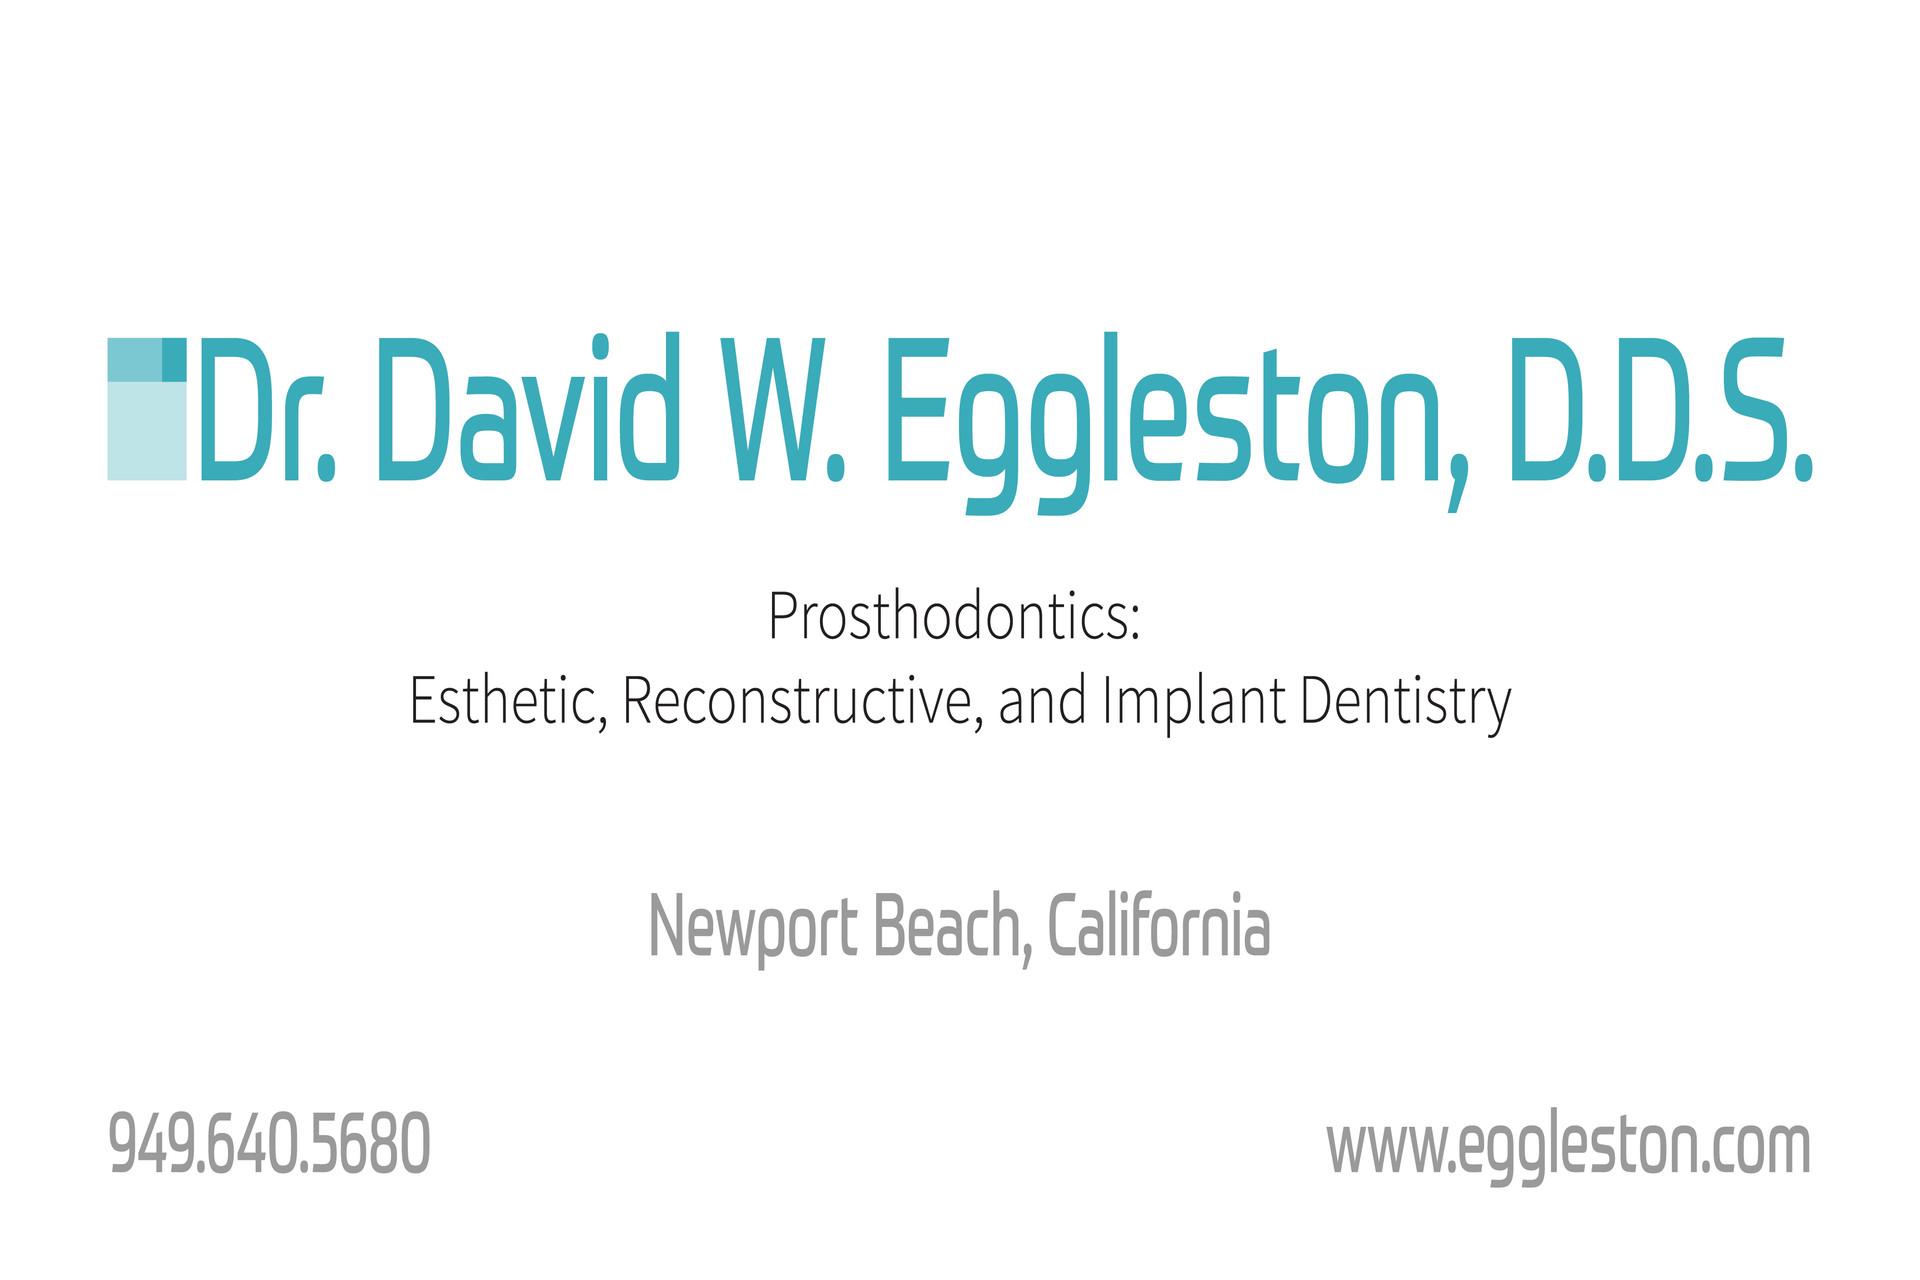 DR. DAVID EGGLESTON, D.D.S.